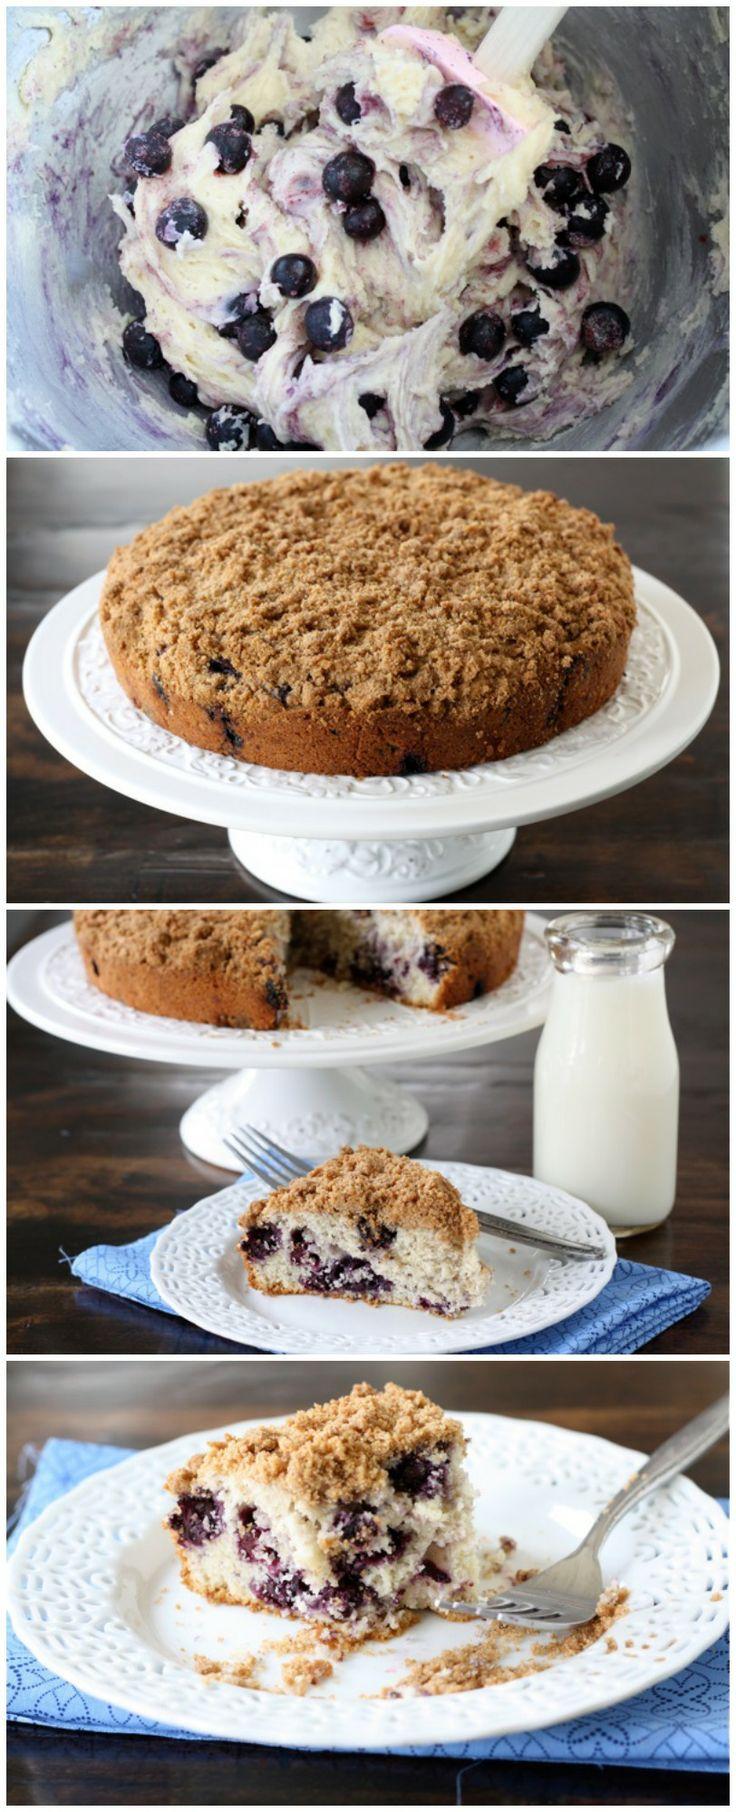 lovecakelovecakelovecake~~Blueberry Buckle Cake Recipe on twopeasandtheirpod.com Great for breakfast or dessert!